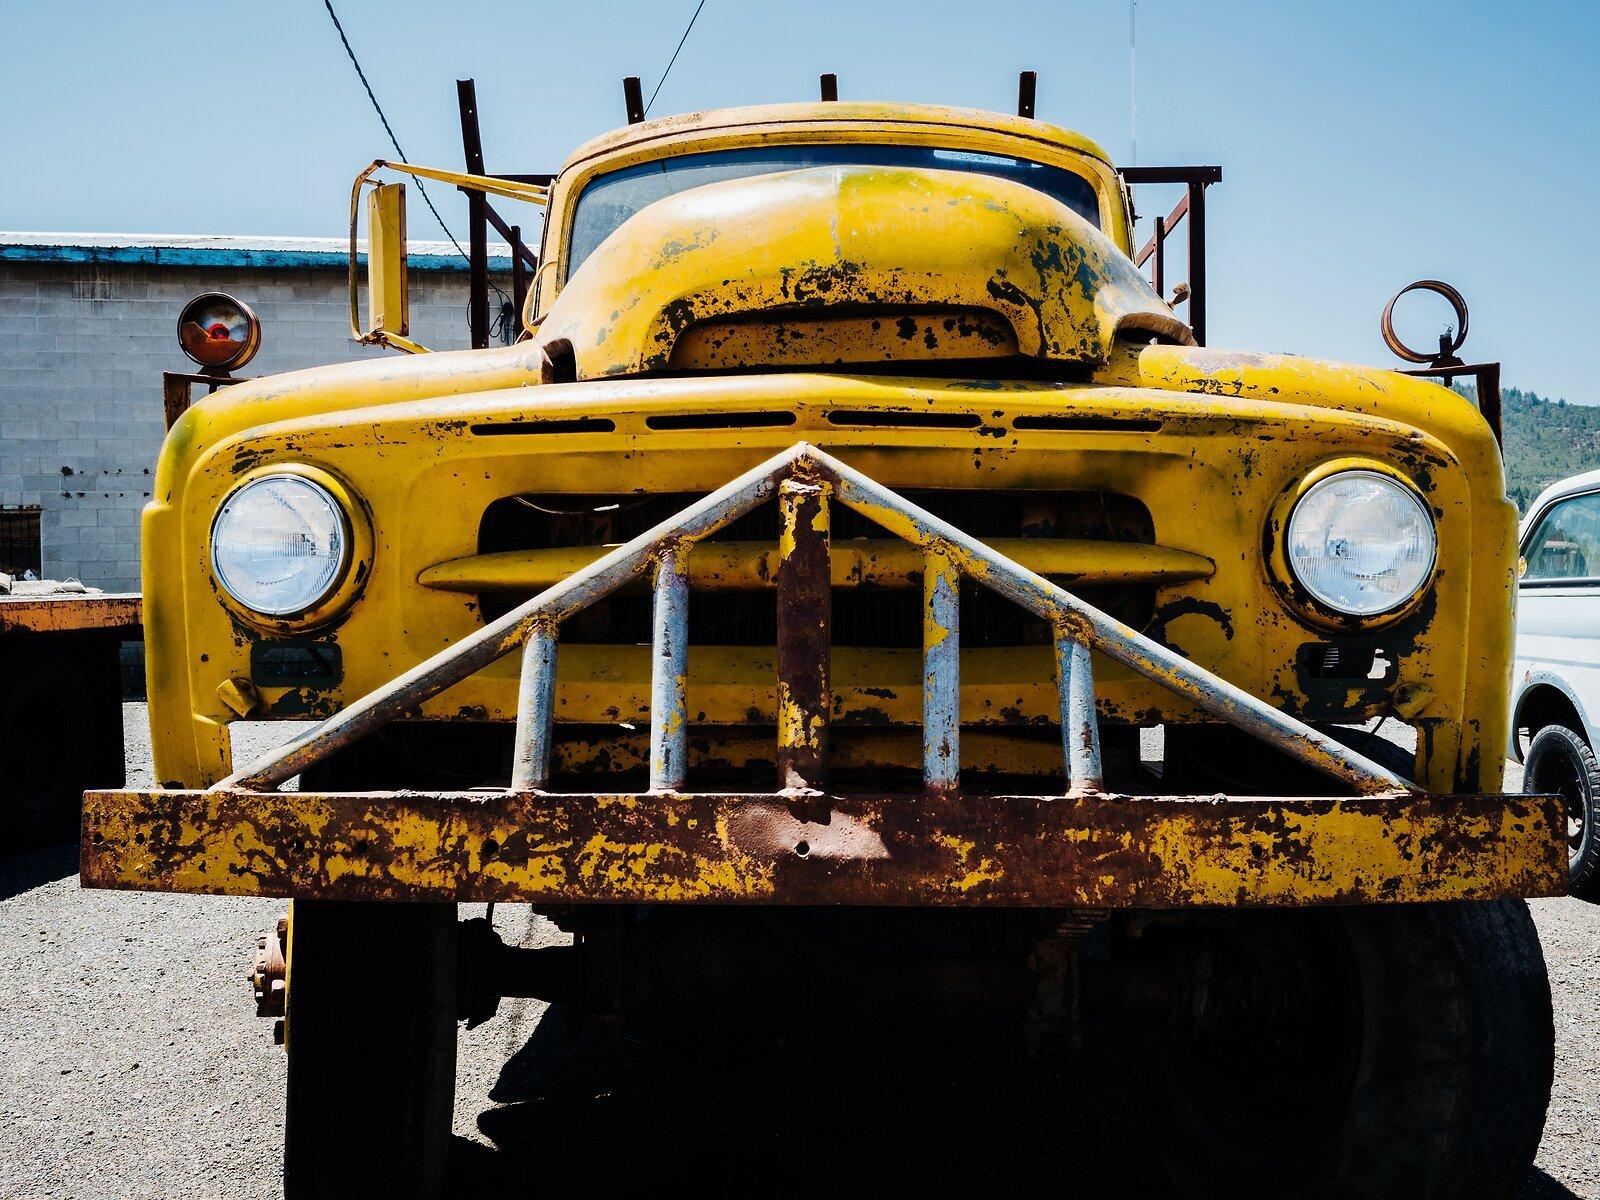 GX9_July6_21_yellow_truck_grill.jpg